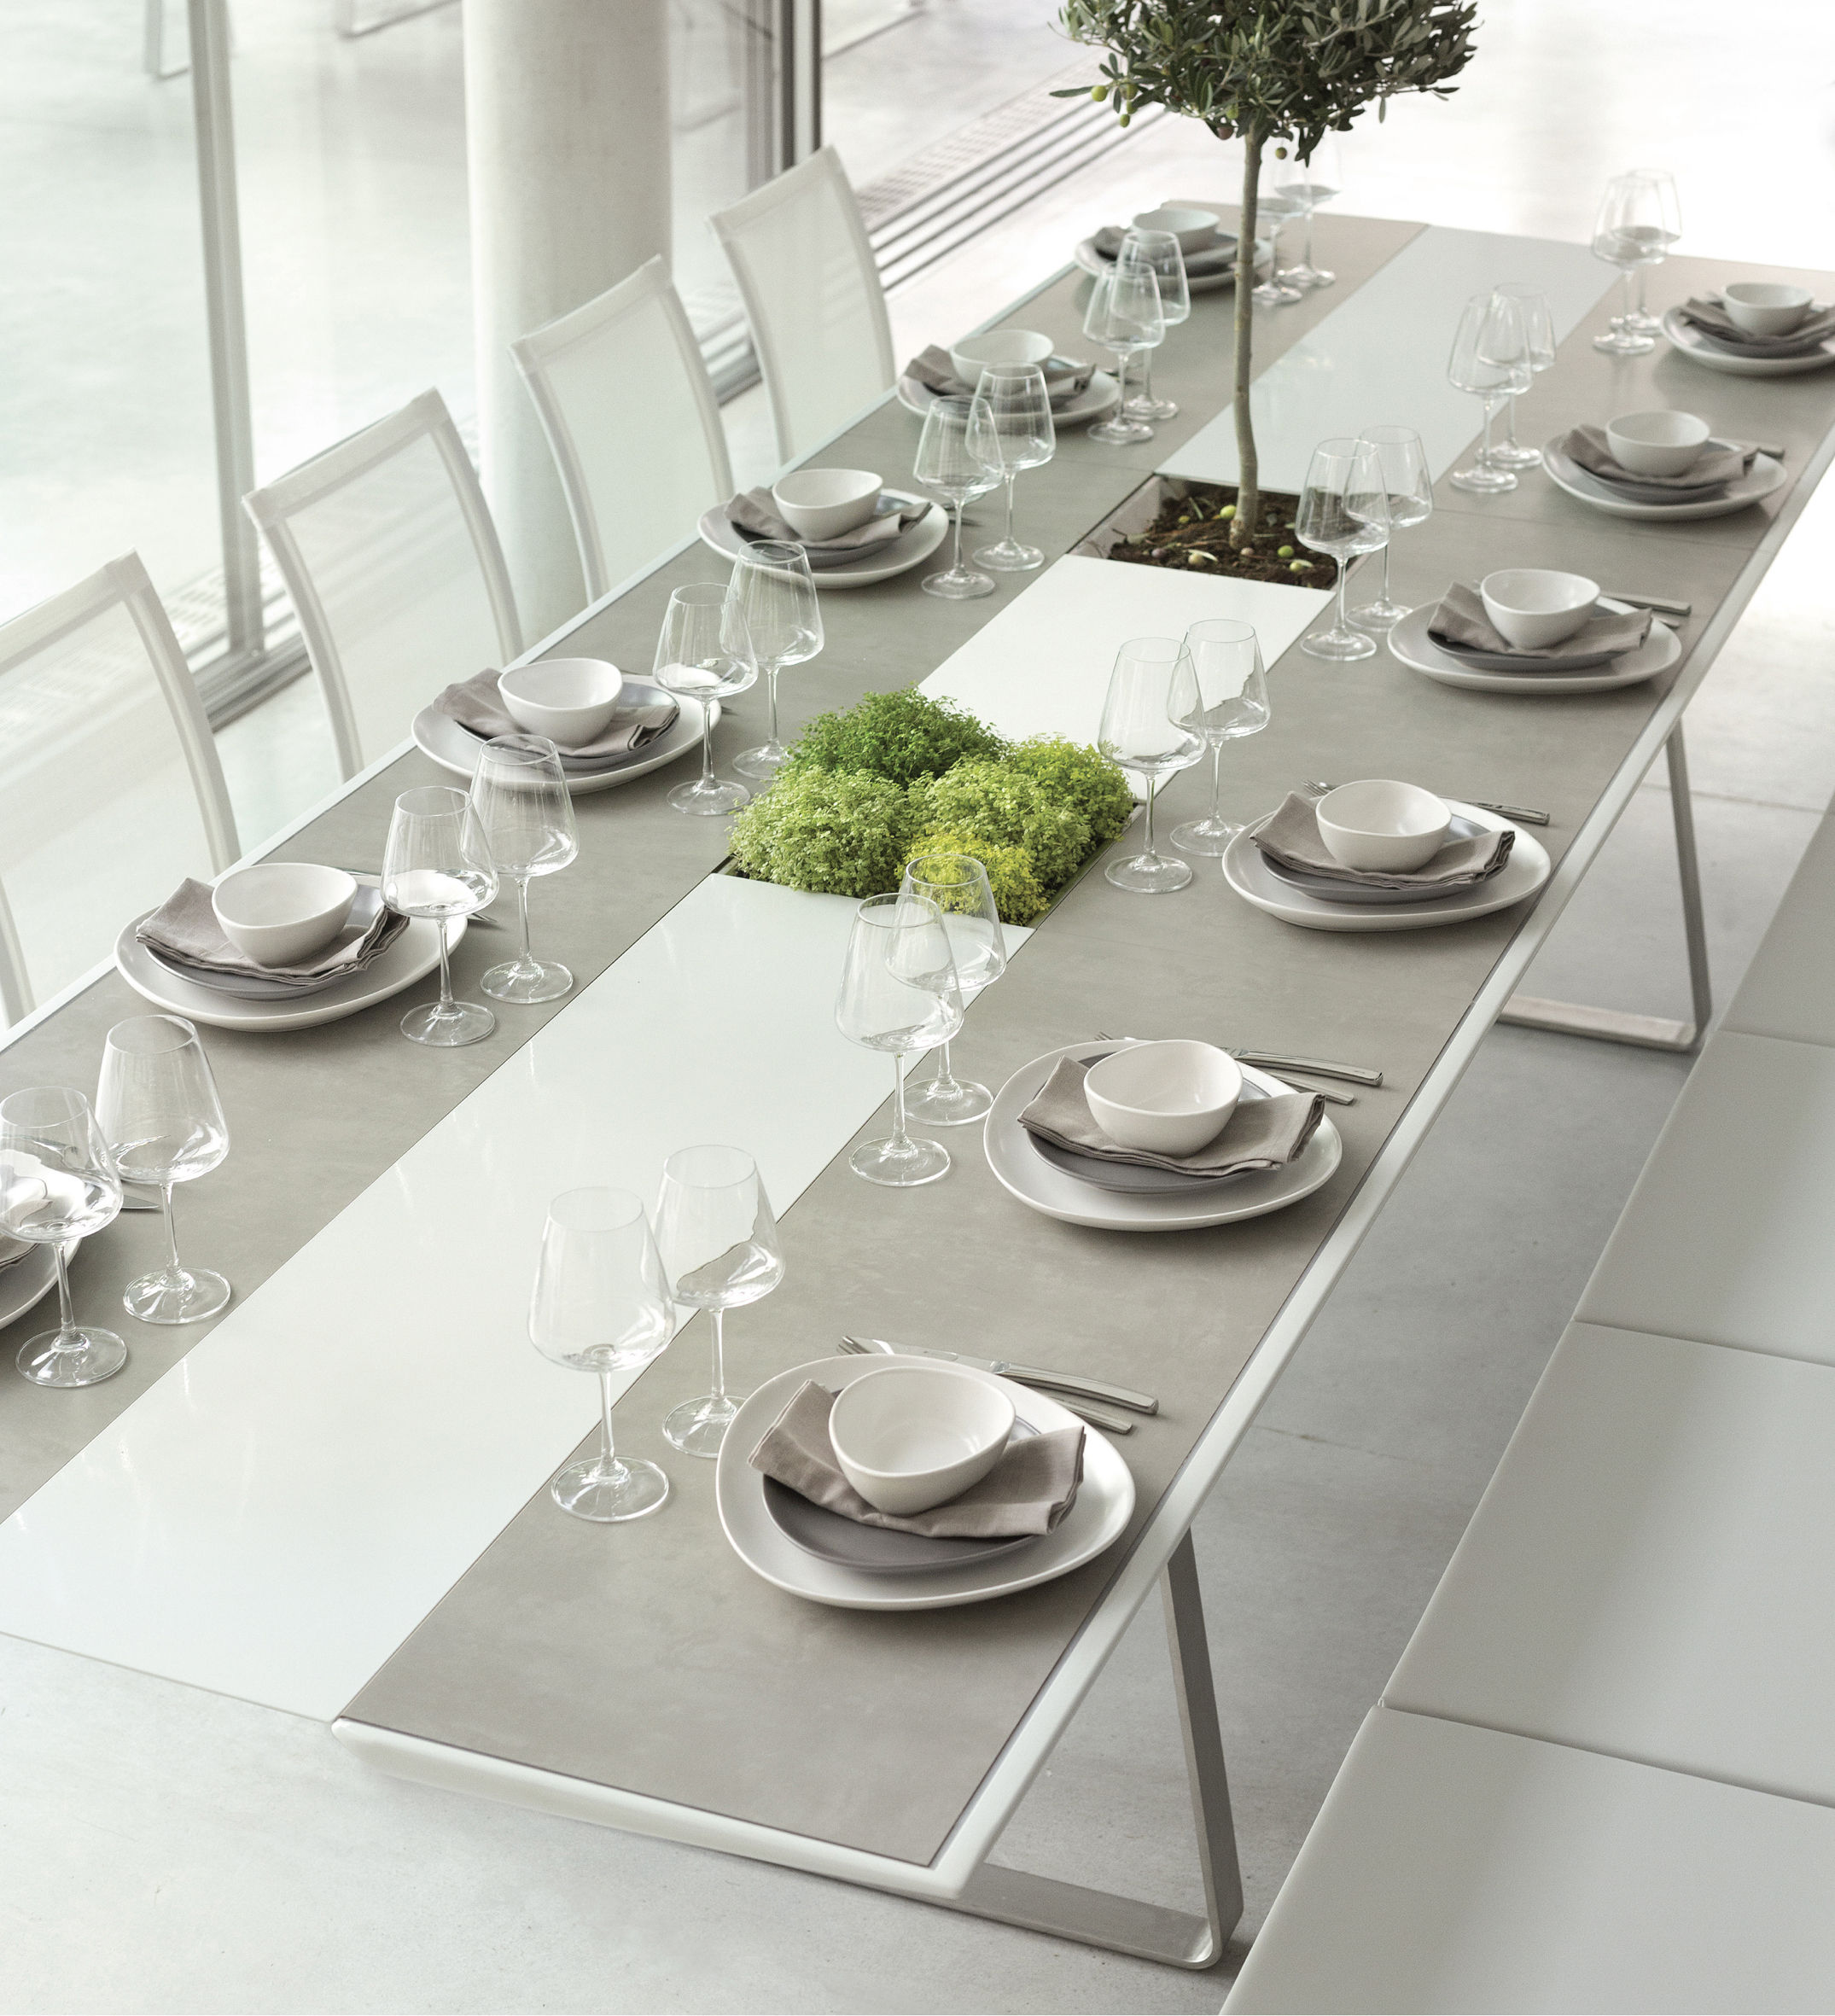 table extrados hpl b ton l 242 cm plateau b ton gris. Black Bedroom Furniture Sets. Home Design Ideas